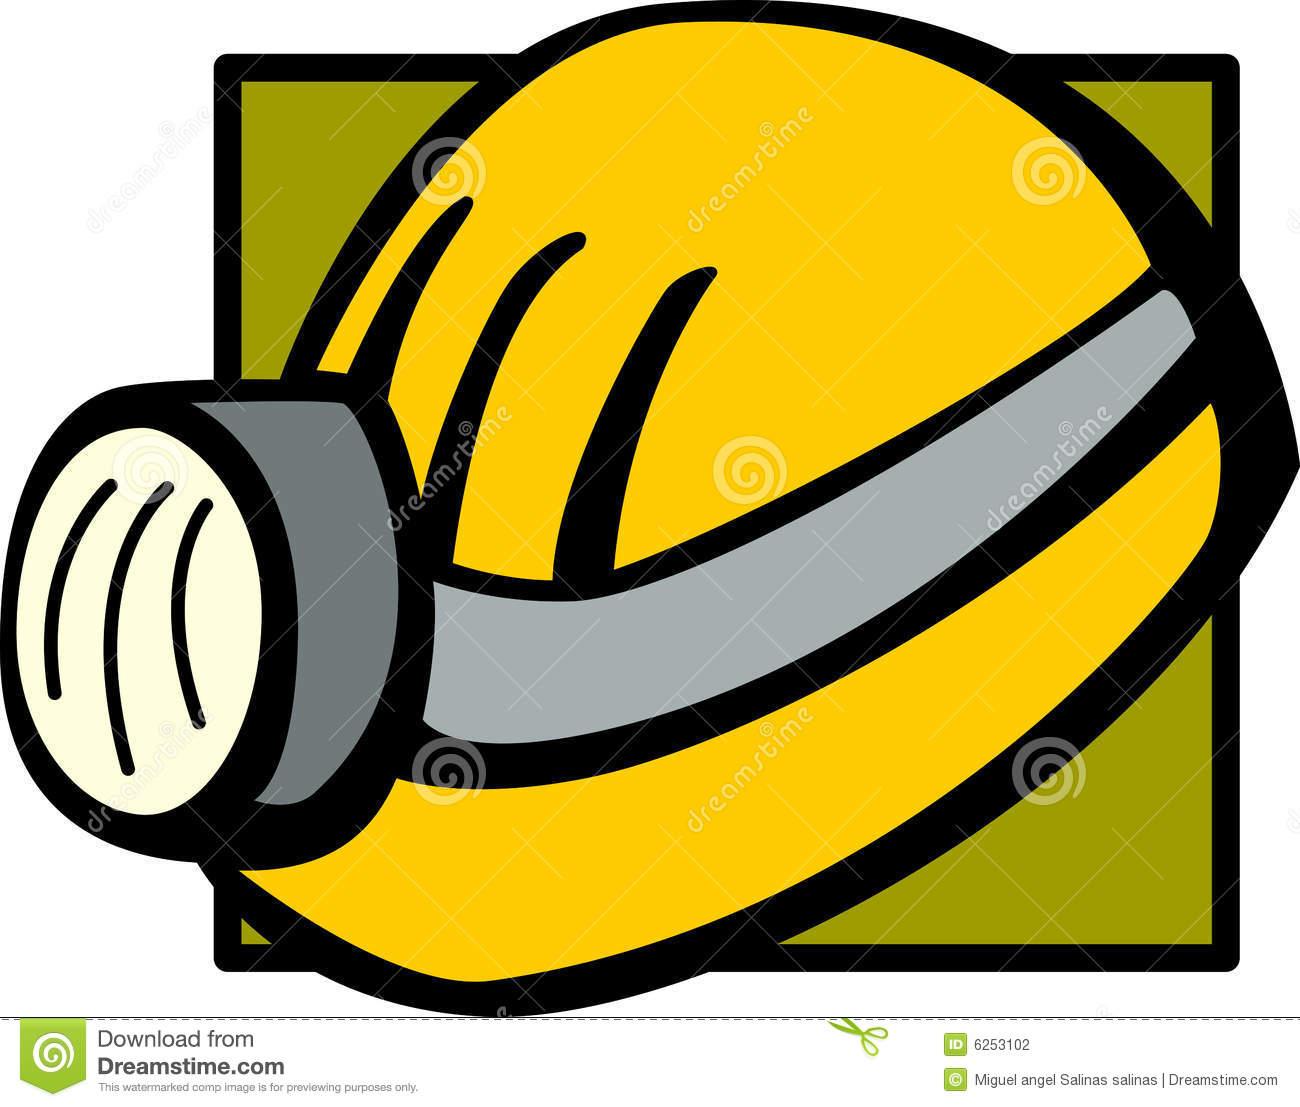 Helmet lamp clipart #16